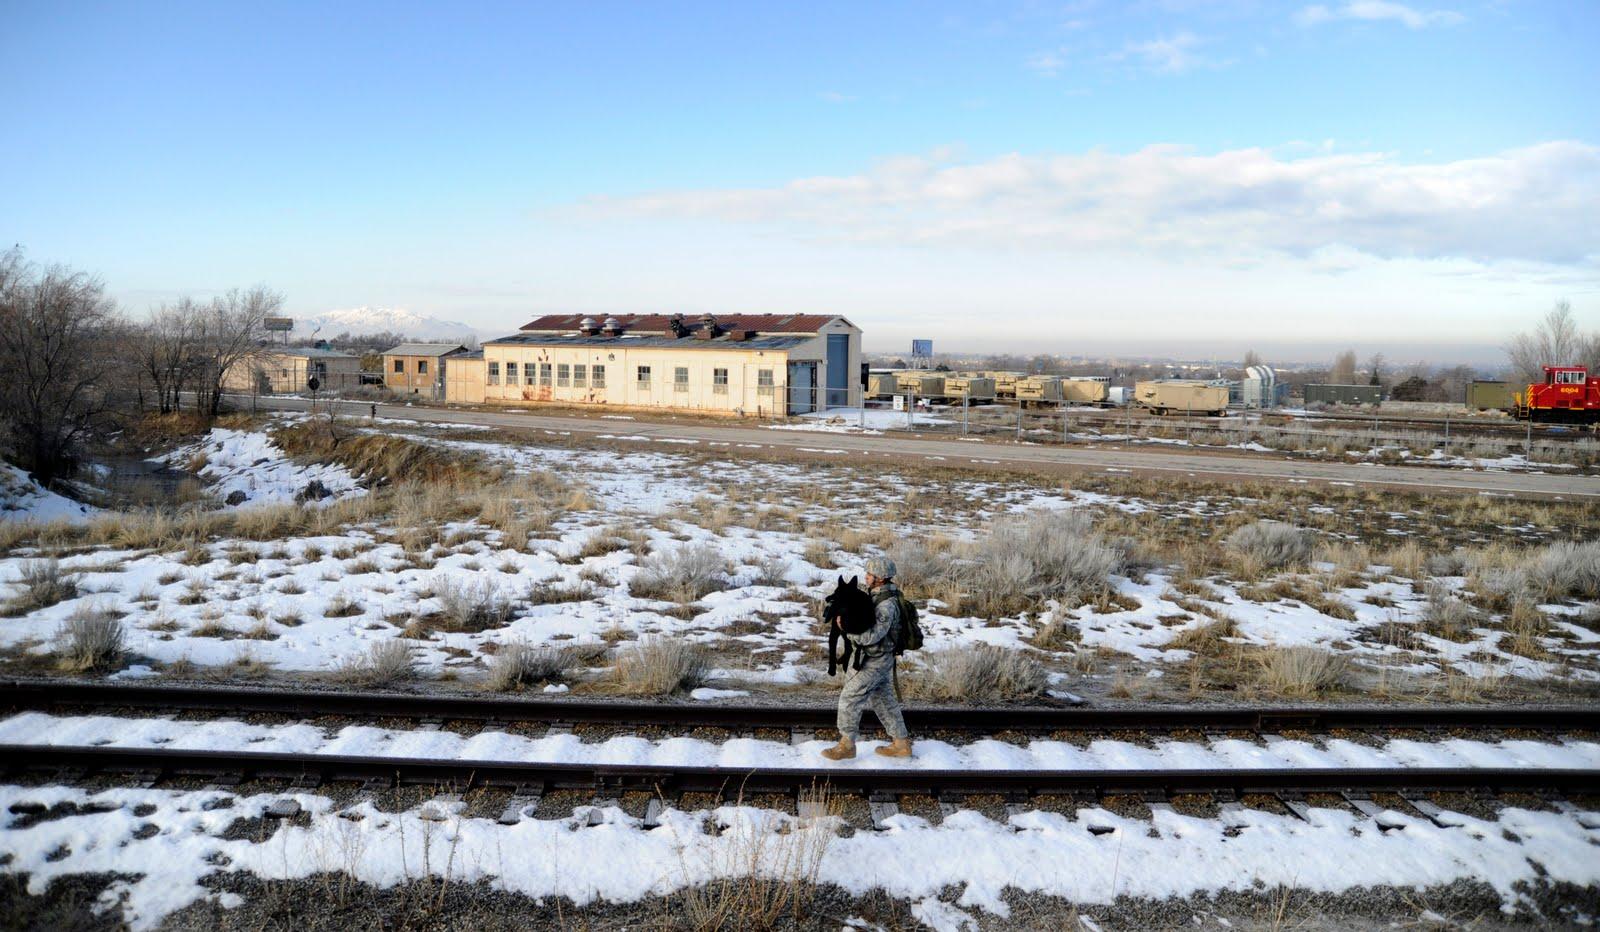 Staff Sgt. Erick Martinez, a military dog handler, carries Argo II March 4, 2011